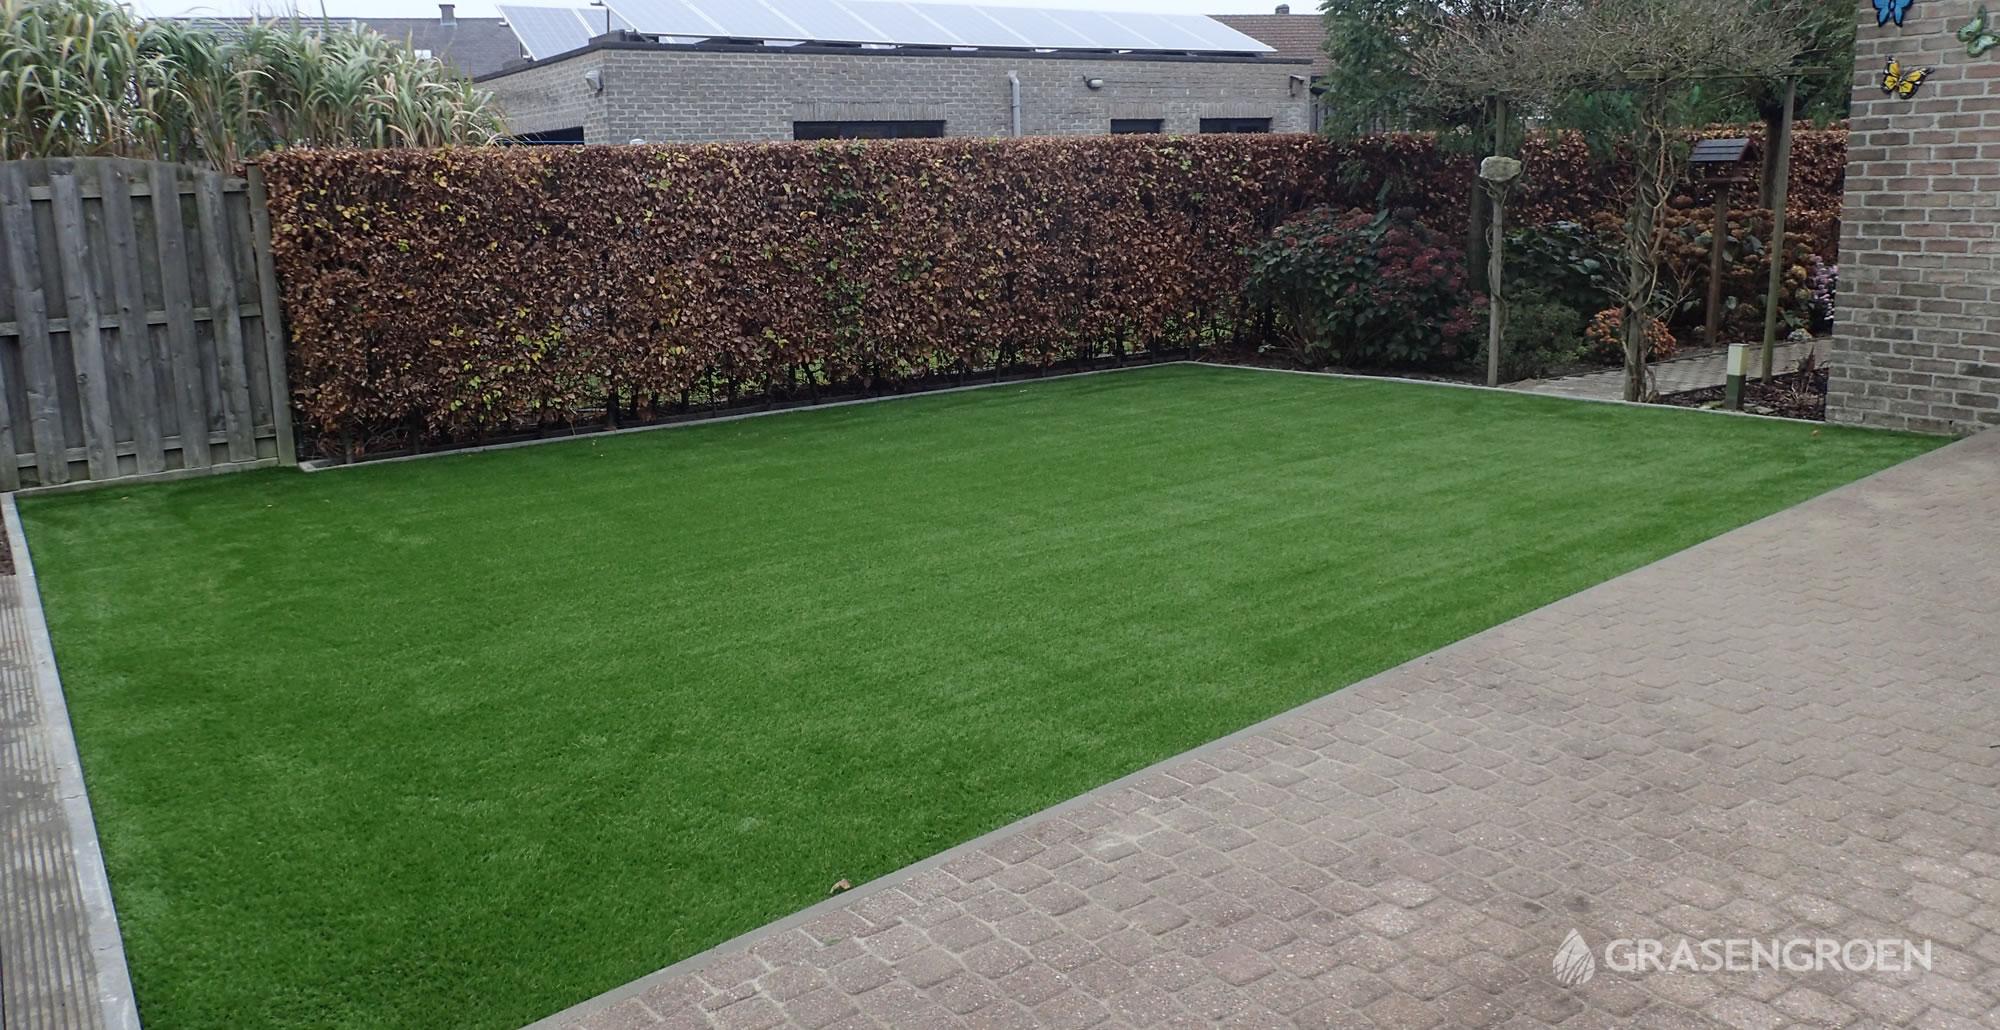 Kunstgrasleggennijlen16 • Gras en Groen Kunstgras